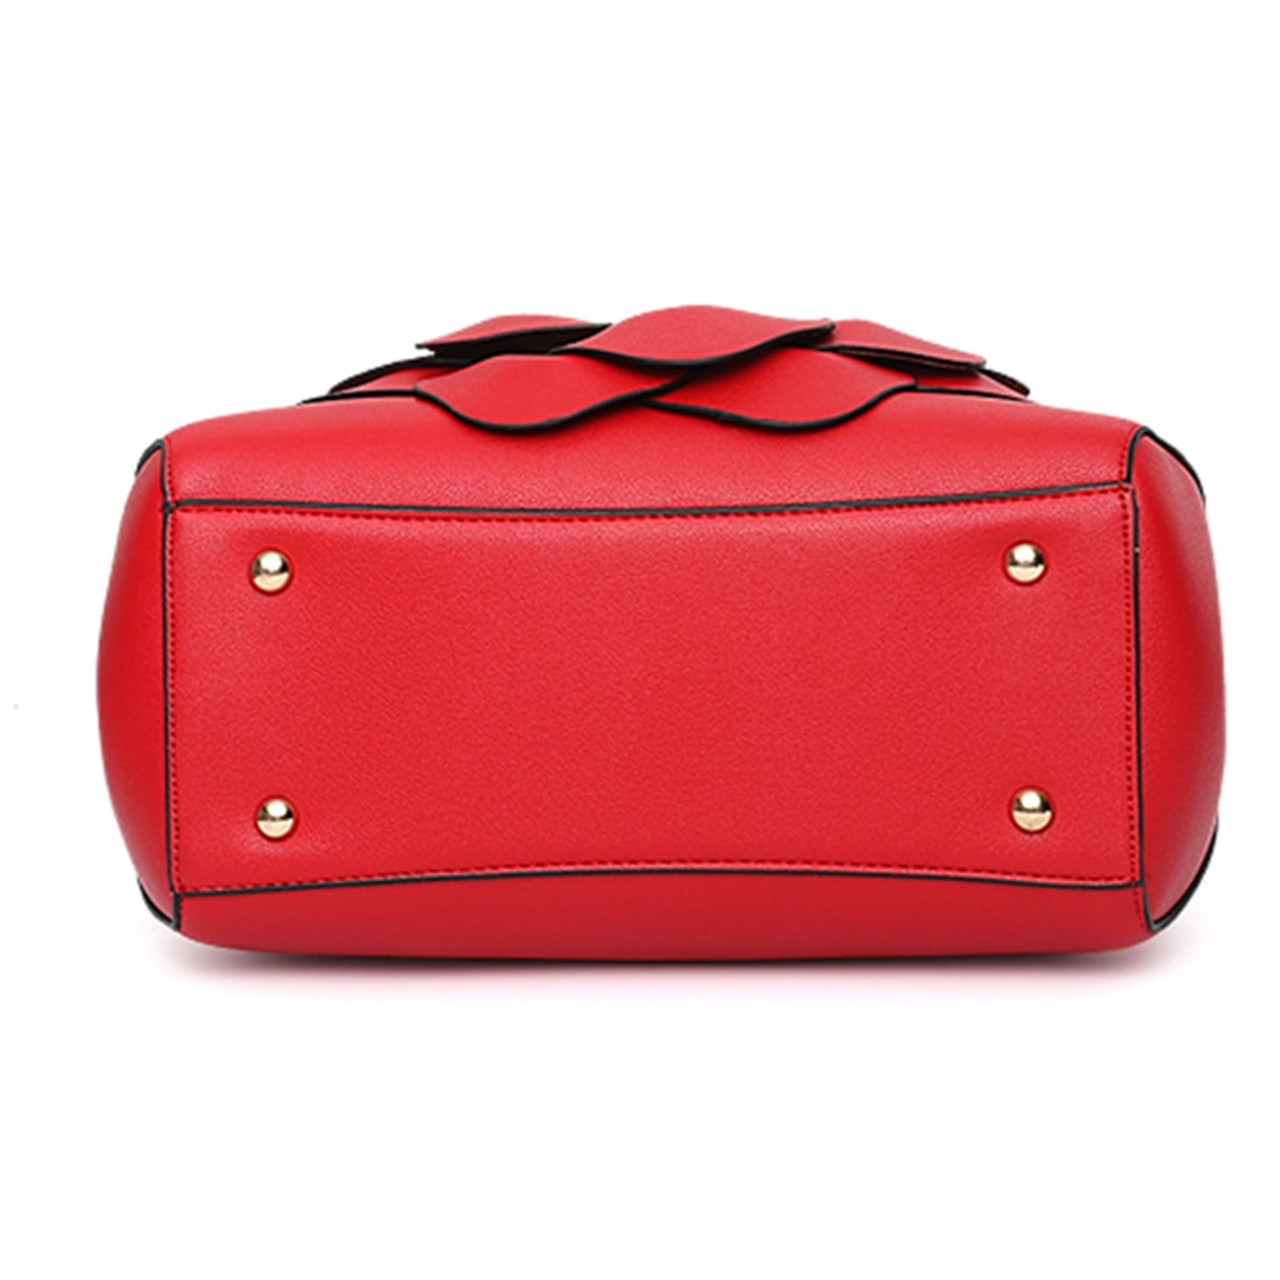 4511ffc76377 ... Nevenka Floral Handbags Women Leather Handbag Black Shoulder Bag Large  Capacity Crossbody Bag for Girls Purse ...